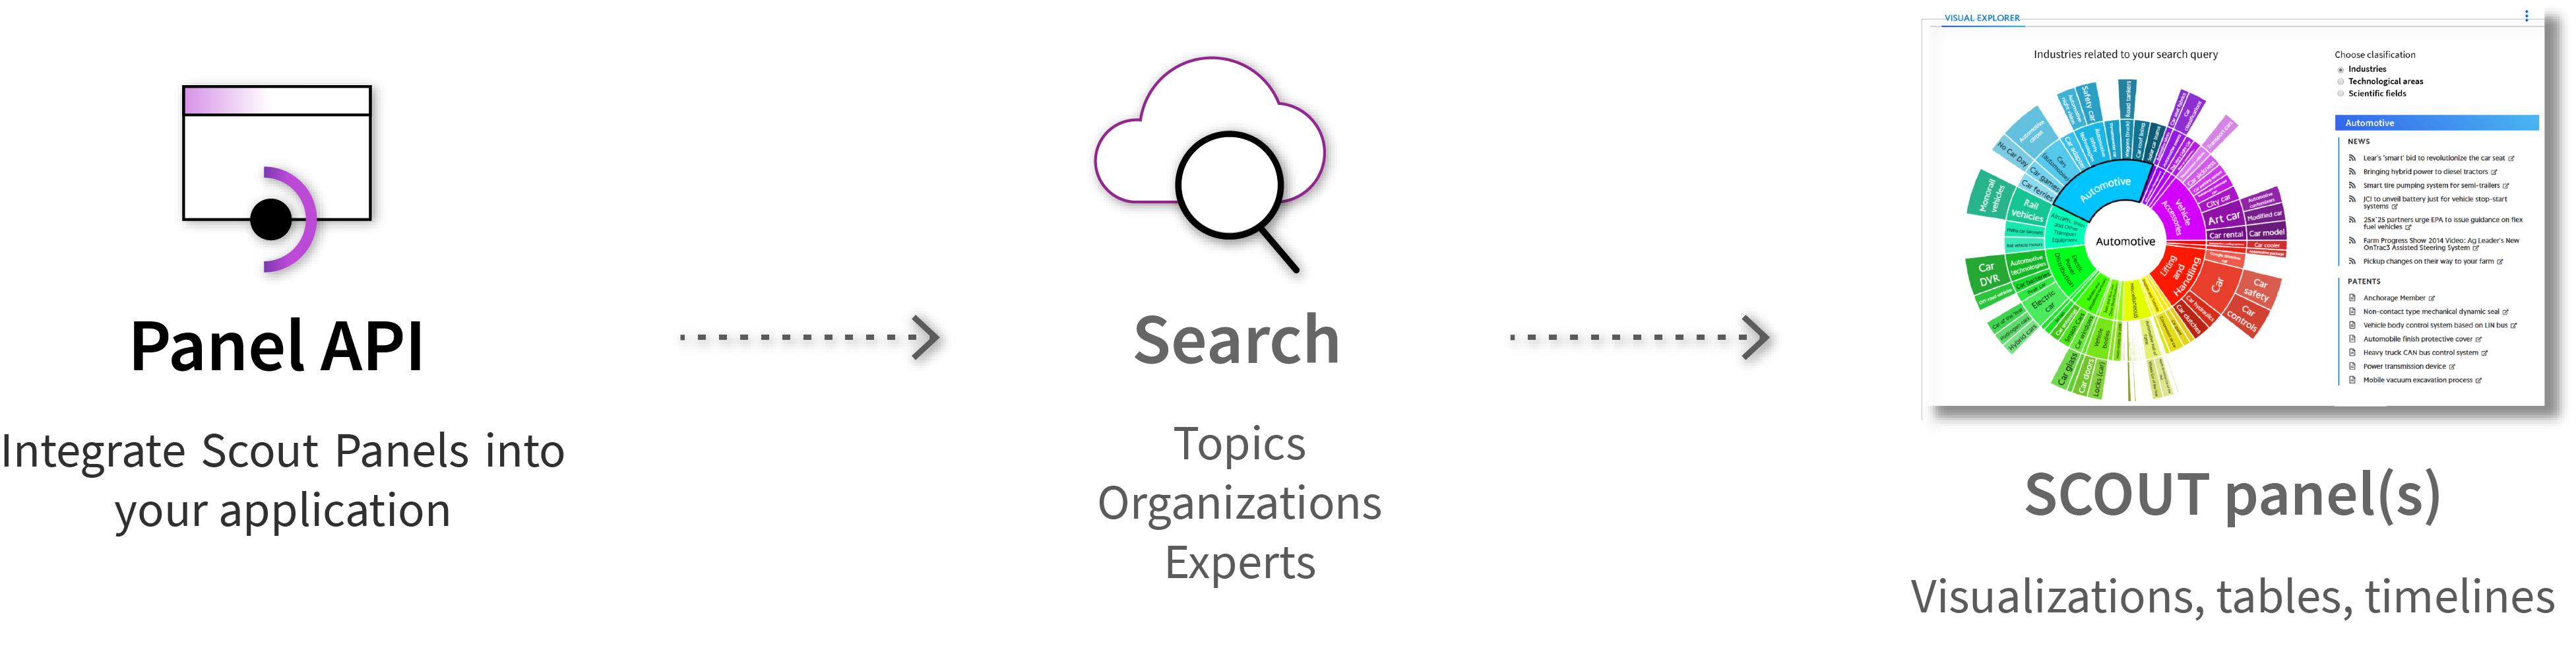 Panel API